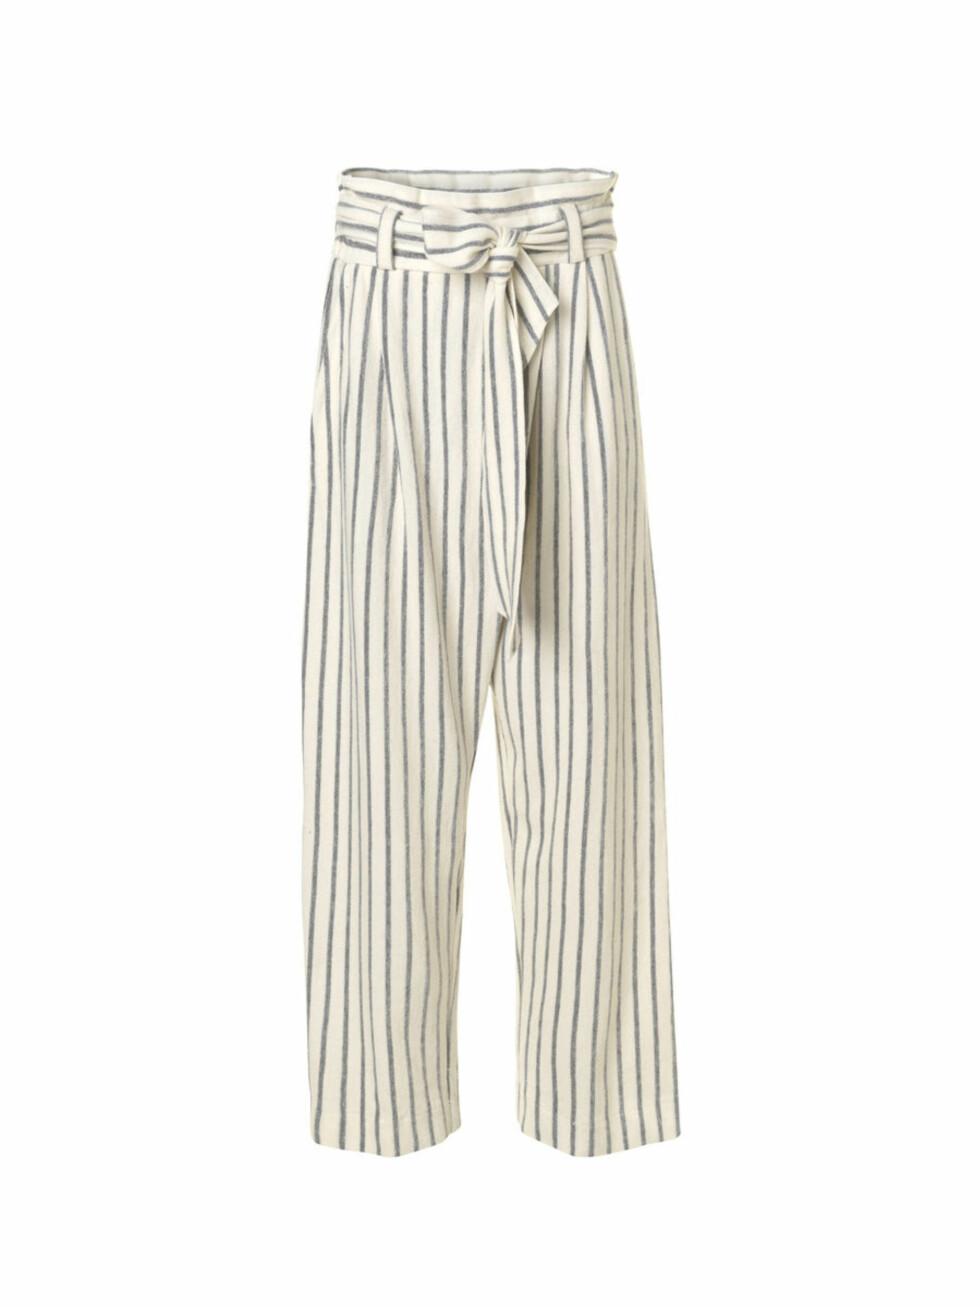 Bukse fra By Malene Birger | kr 899 | http://www.bymalenebirger.com/no/sale/ginas-trousers-Q62825002.html?cgid=Wd1404286&dwvar_Q62825002_color=03Z